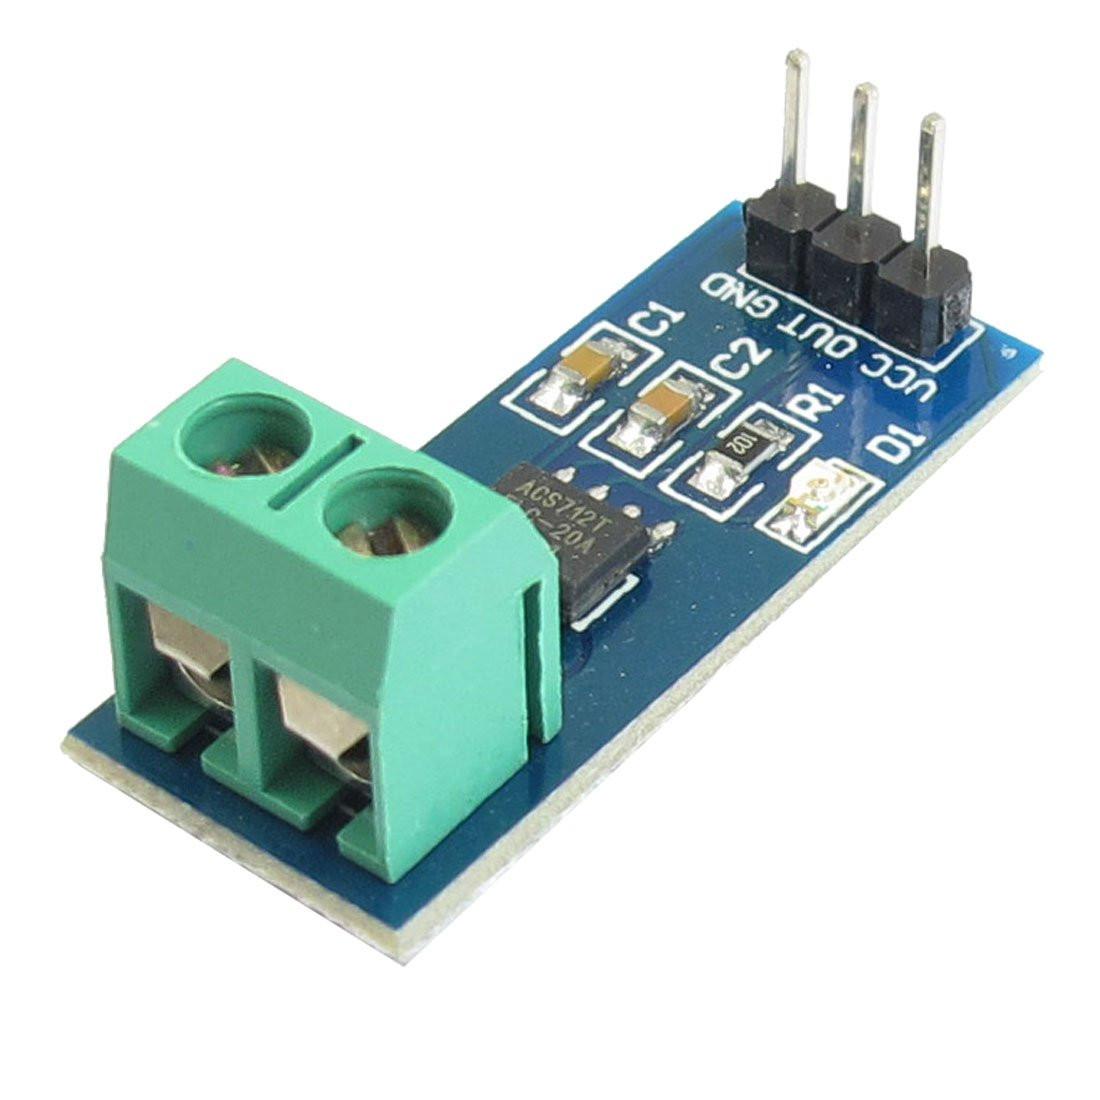 Датчик тока 5А ACS712, эфф. Холла, модуль Arduino